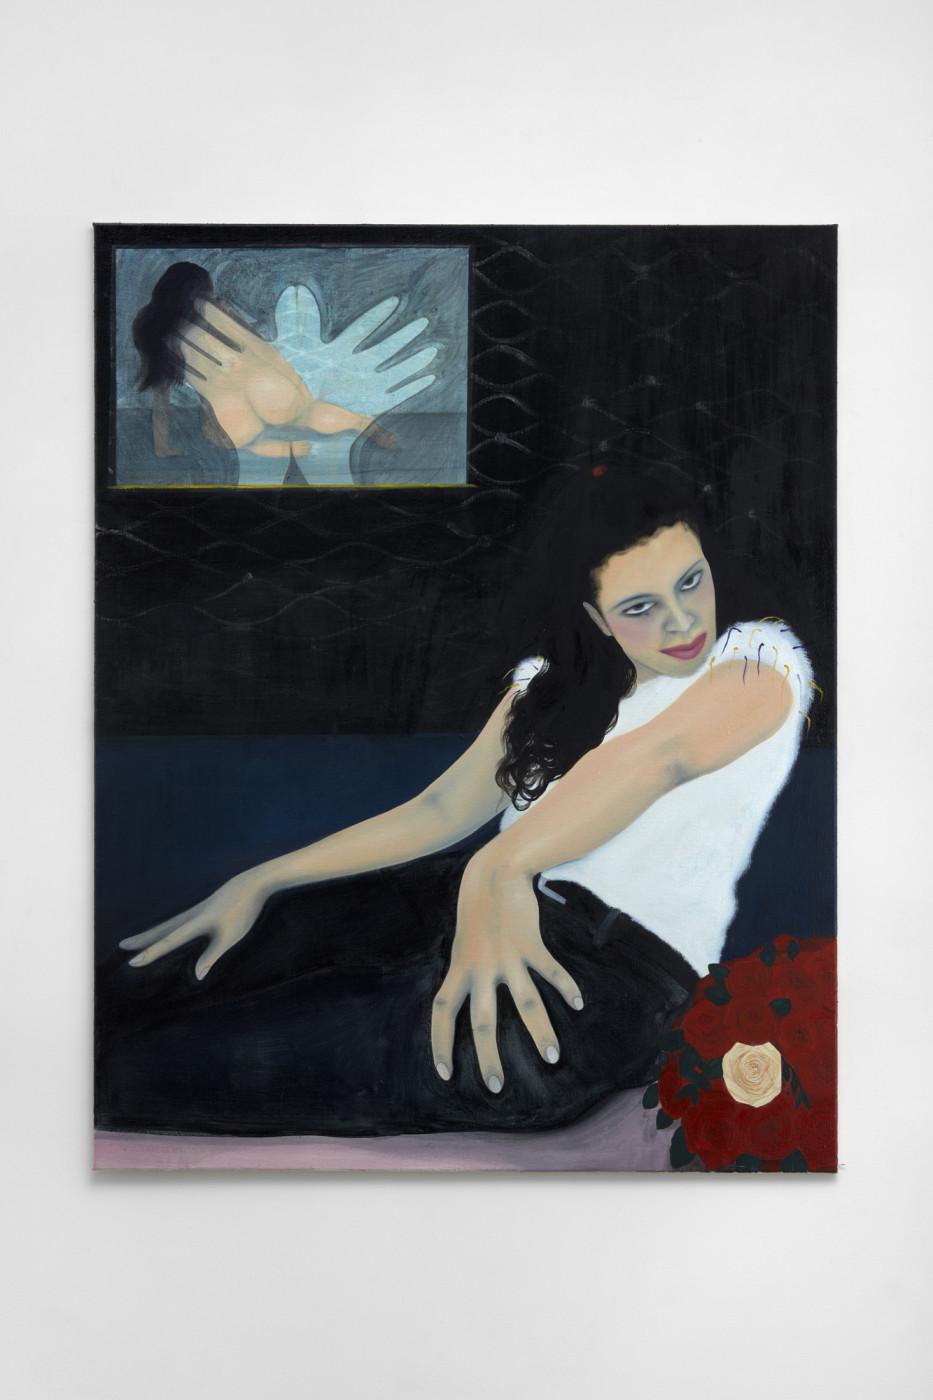 "<div class=""title""><em>From the black into the blue</em>, 2018</div><div class=""medium"">oil and acrylic on burlap</div><div class=""dimensions"">160 x 124 cm / 63 x 48 ⅞ in<br />Photo: Robert Glowacki</div>"